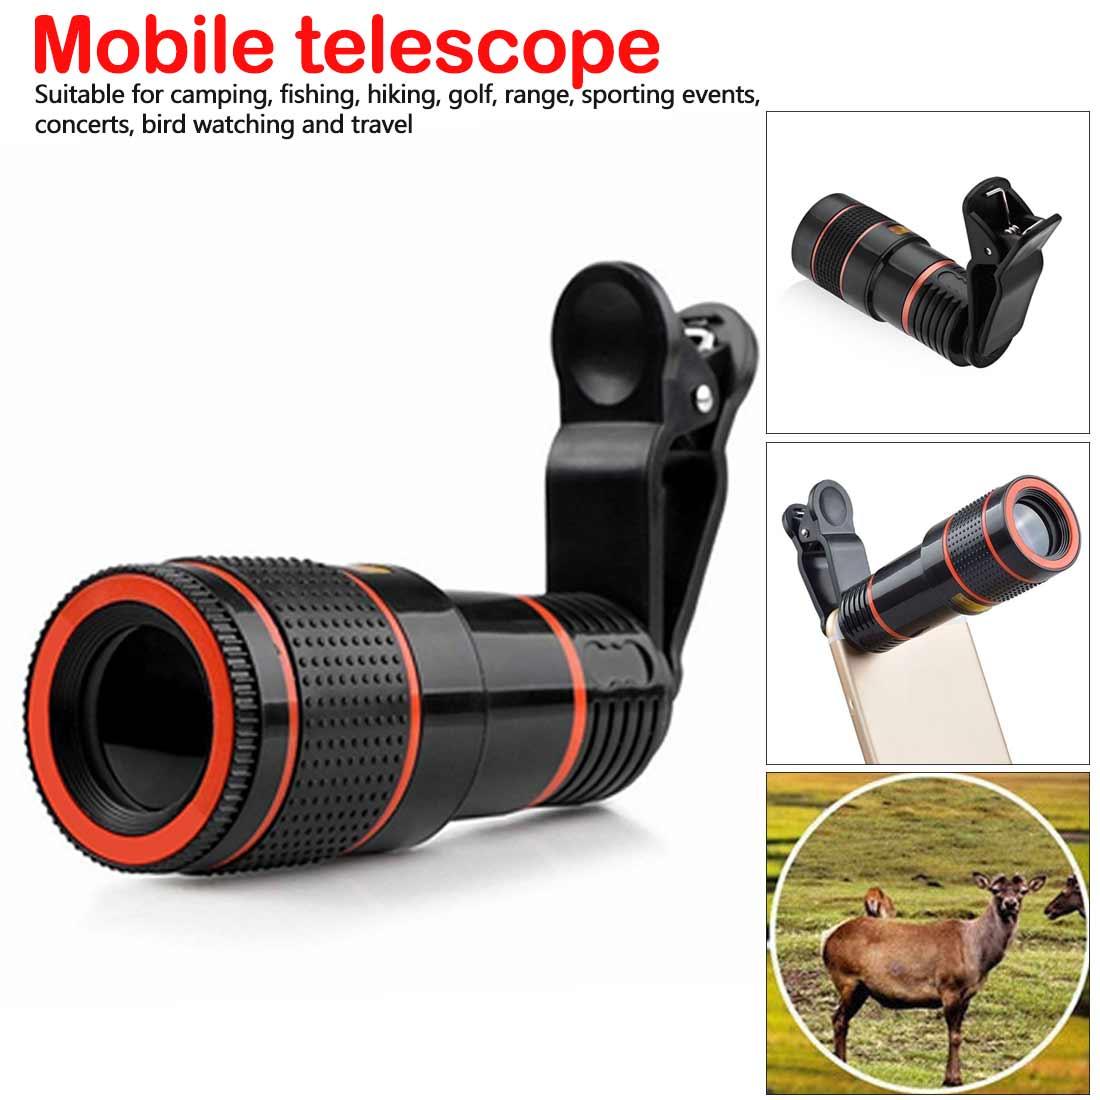 Lente Universal 12X teleobjetivo para teléfono móvil enfoque zoom telescopio cabeza HD externo Cámara 12 veces lente